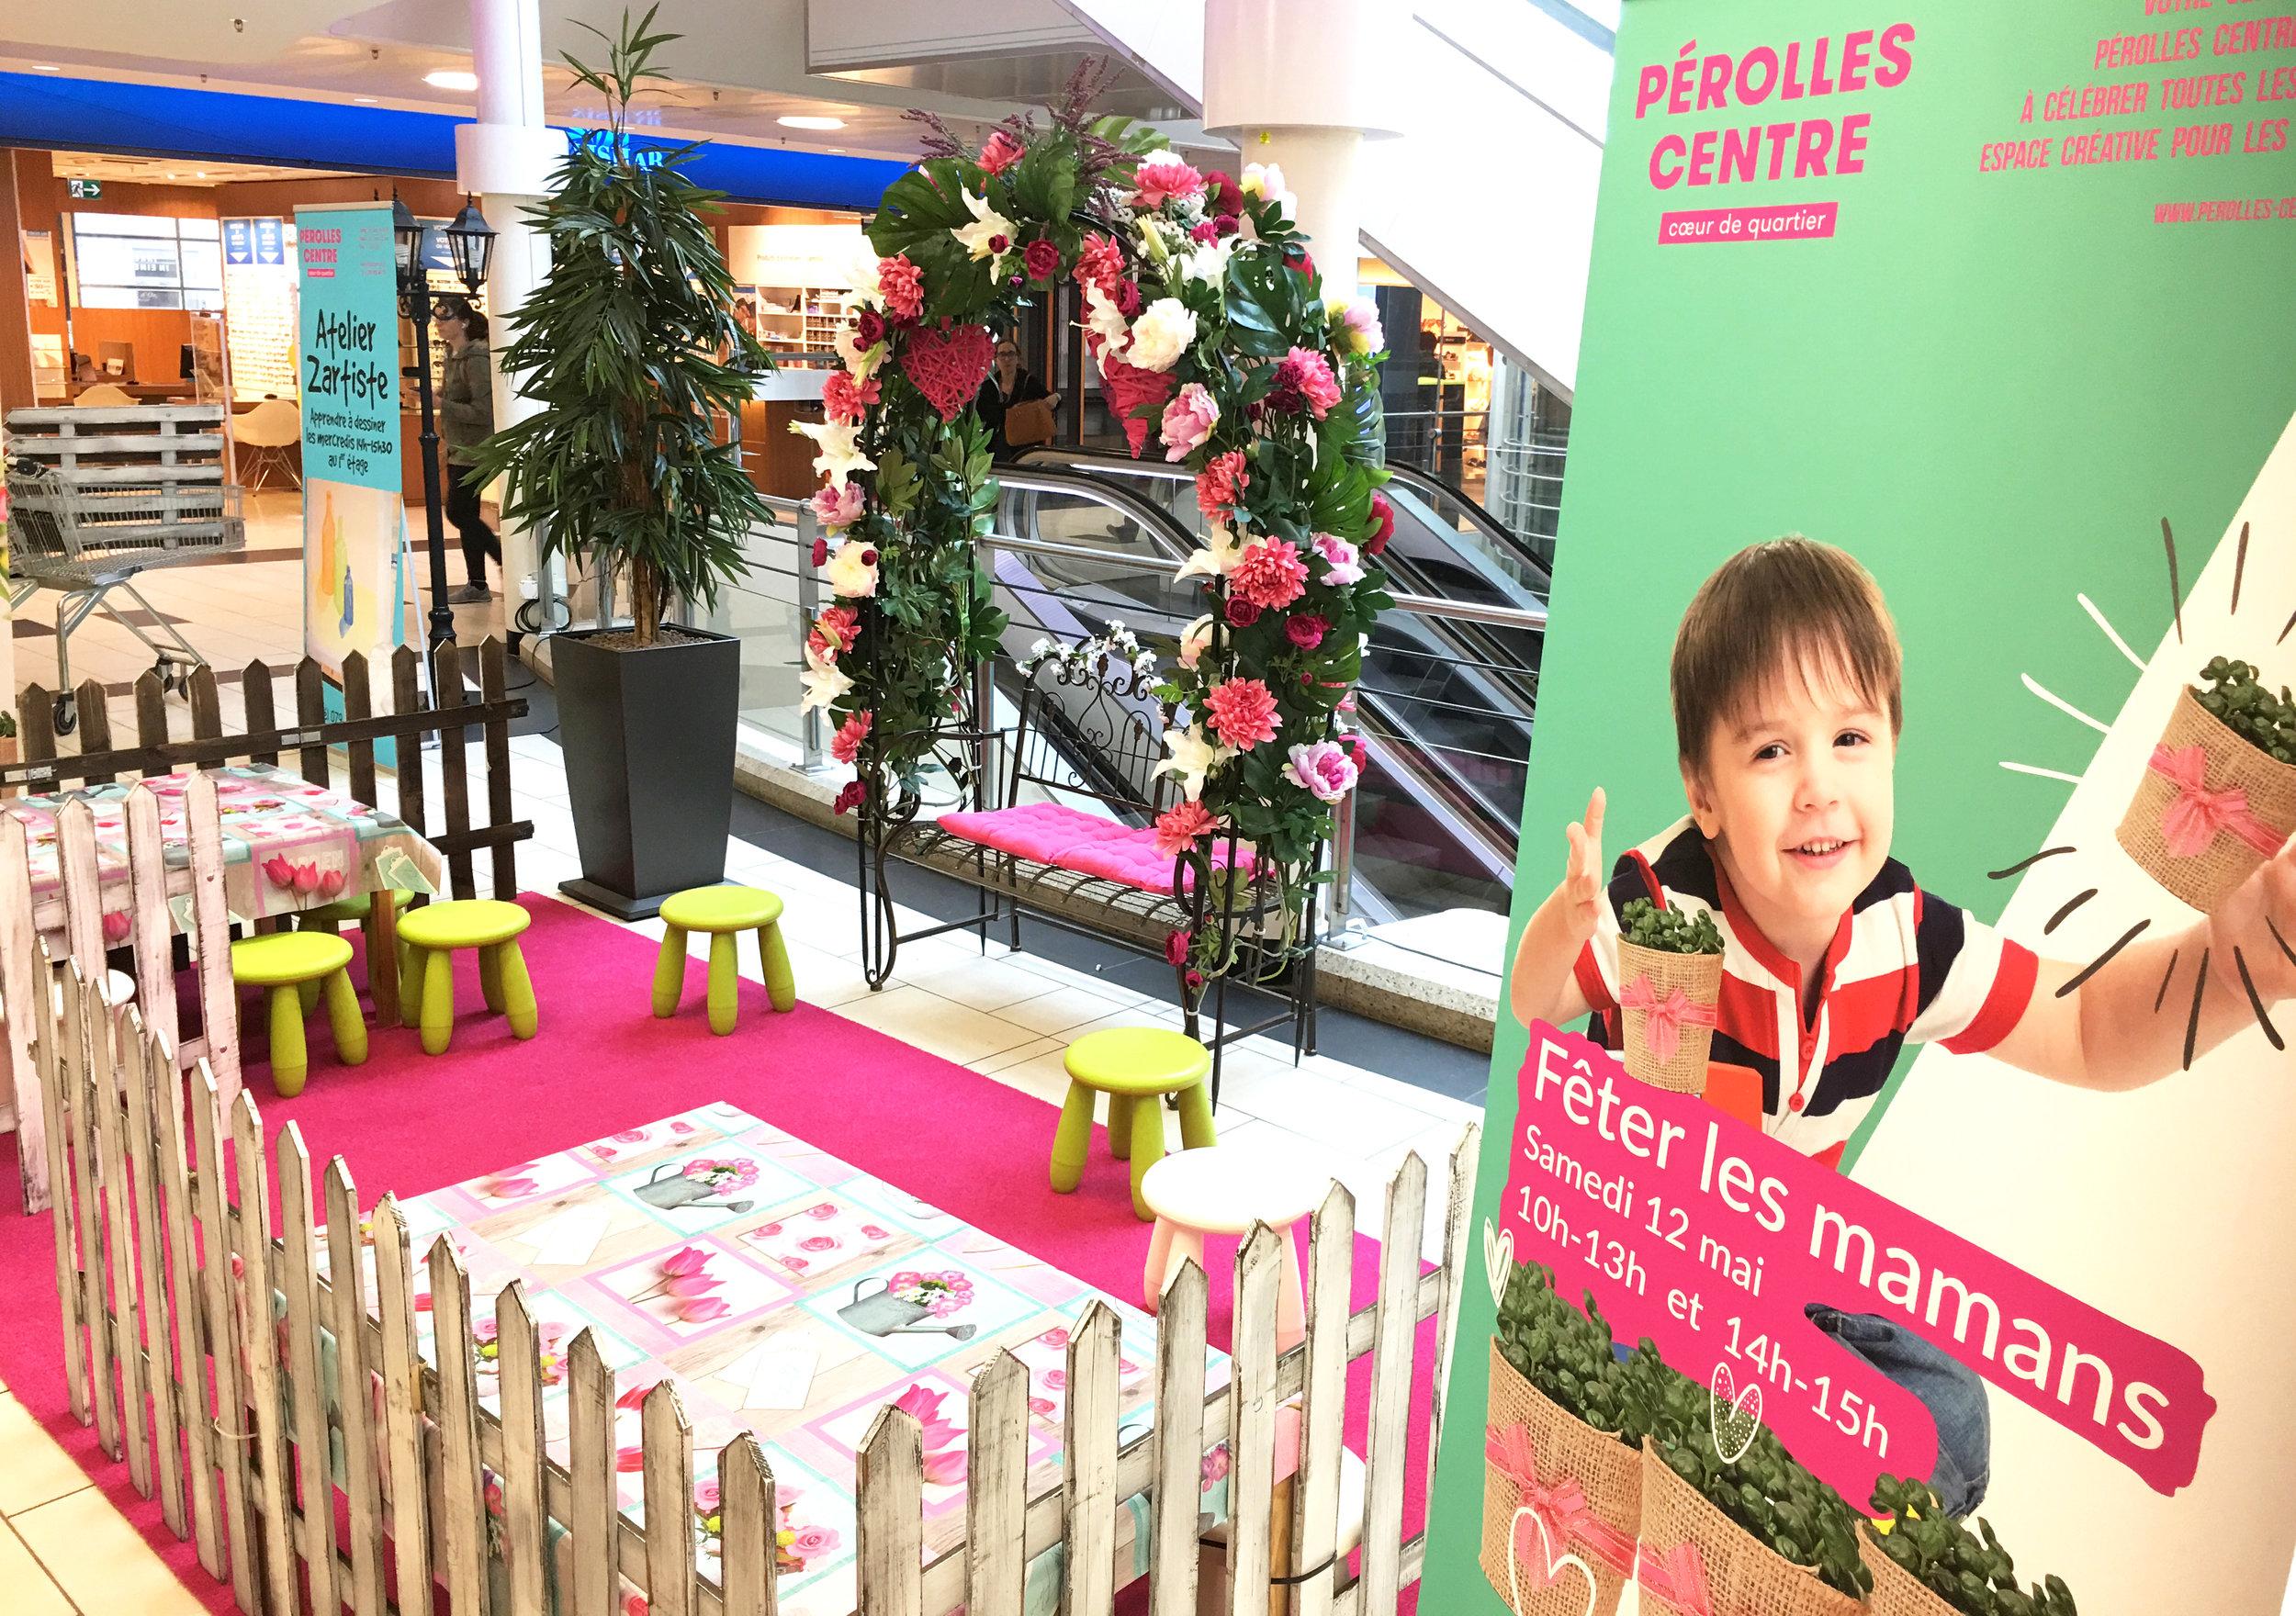 stand-decoration-rose-moms-day2.jpg